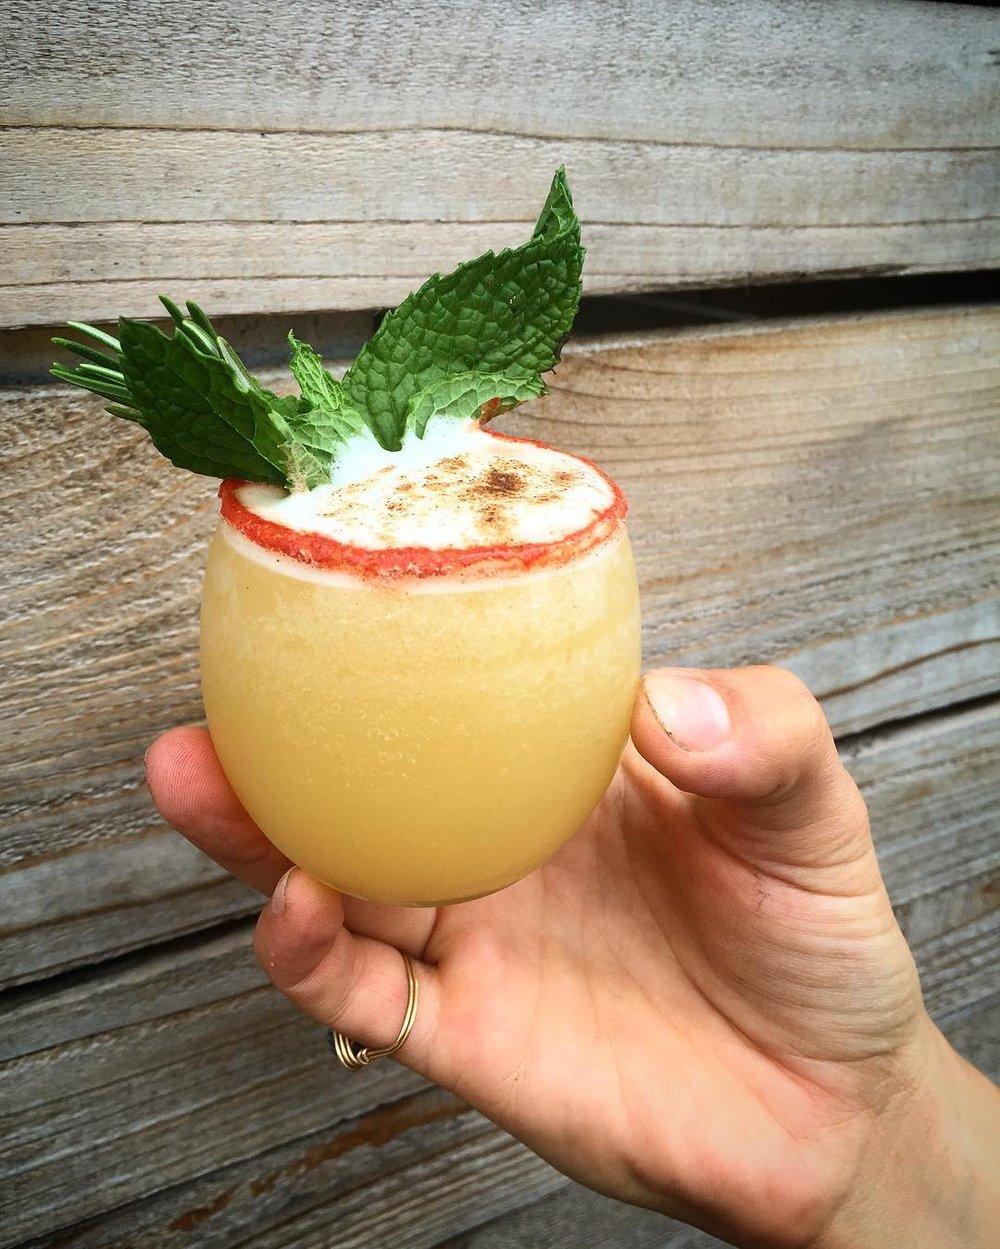 Rum + pineapple + coconut + flair